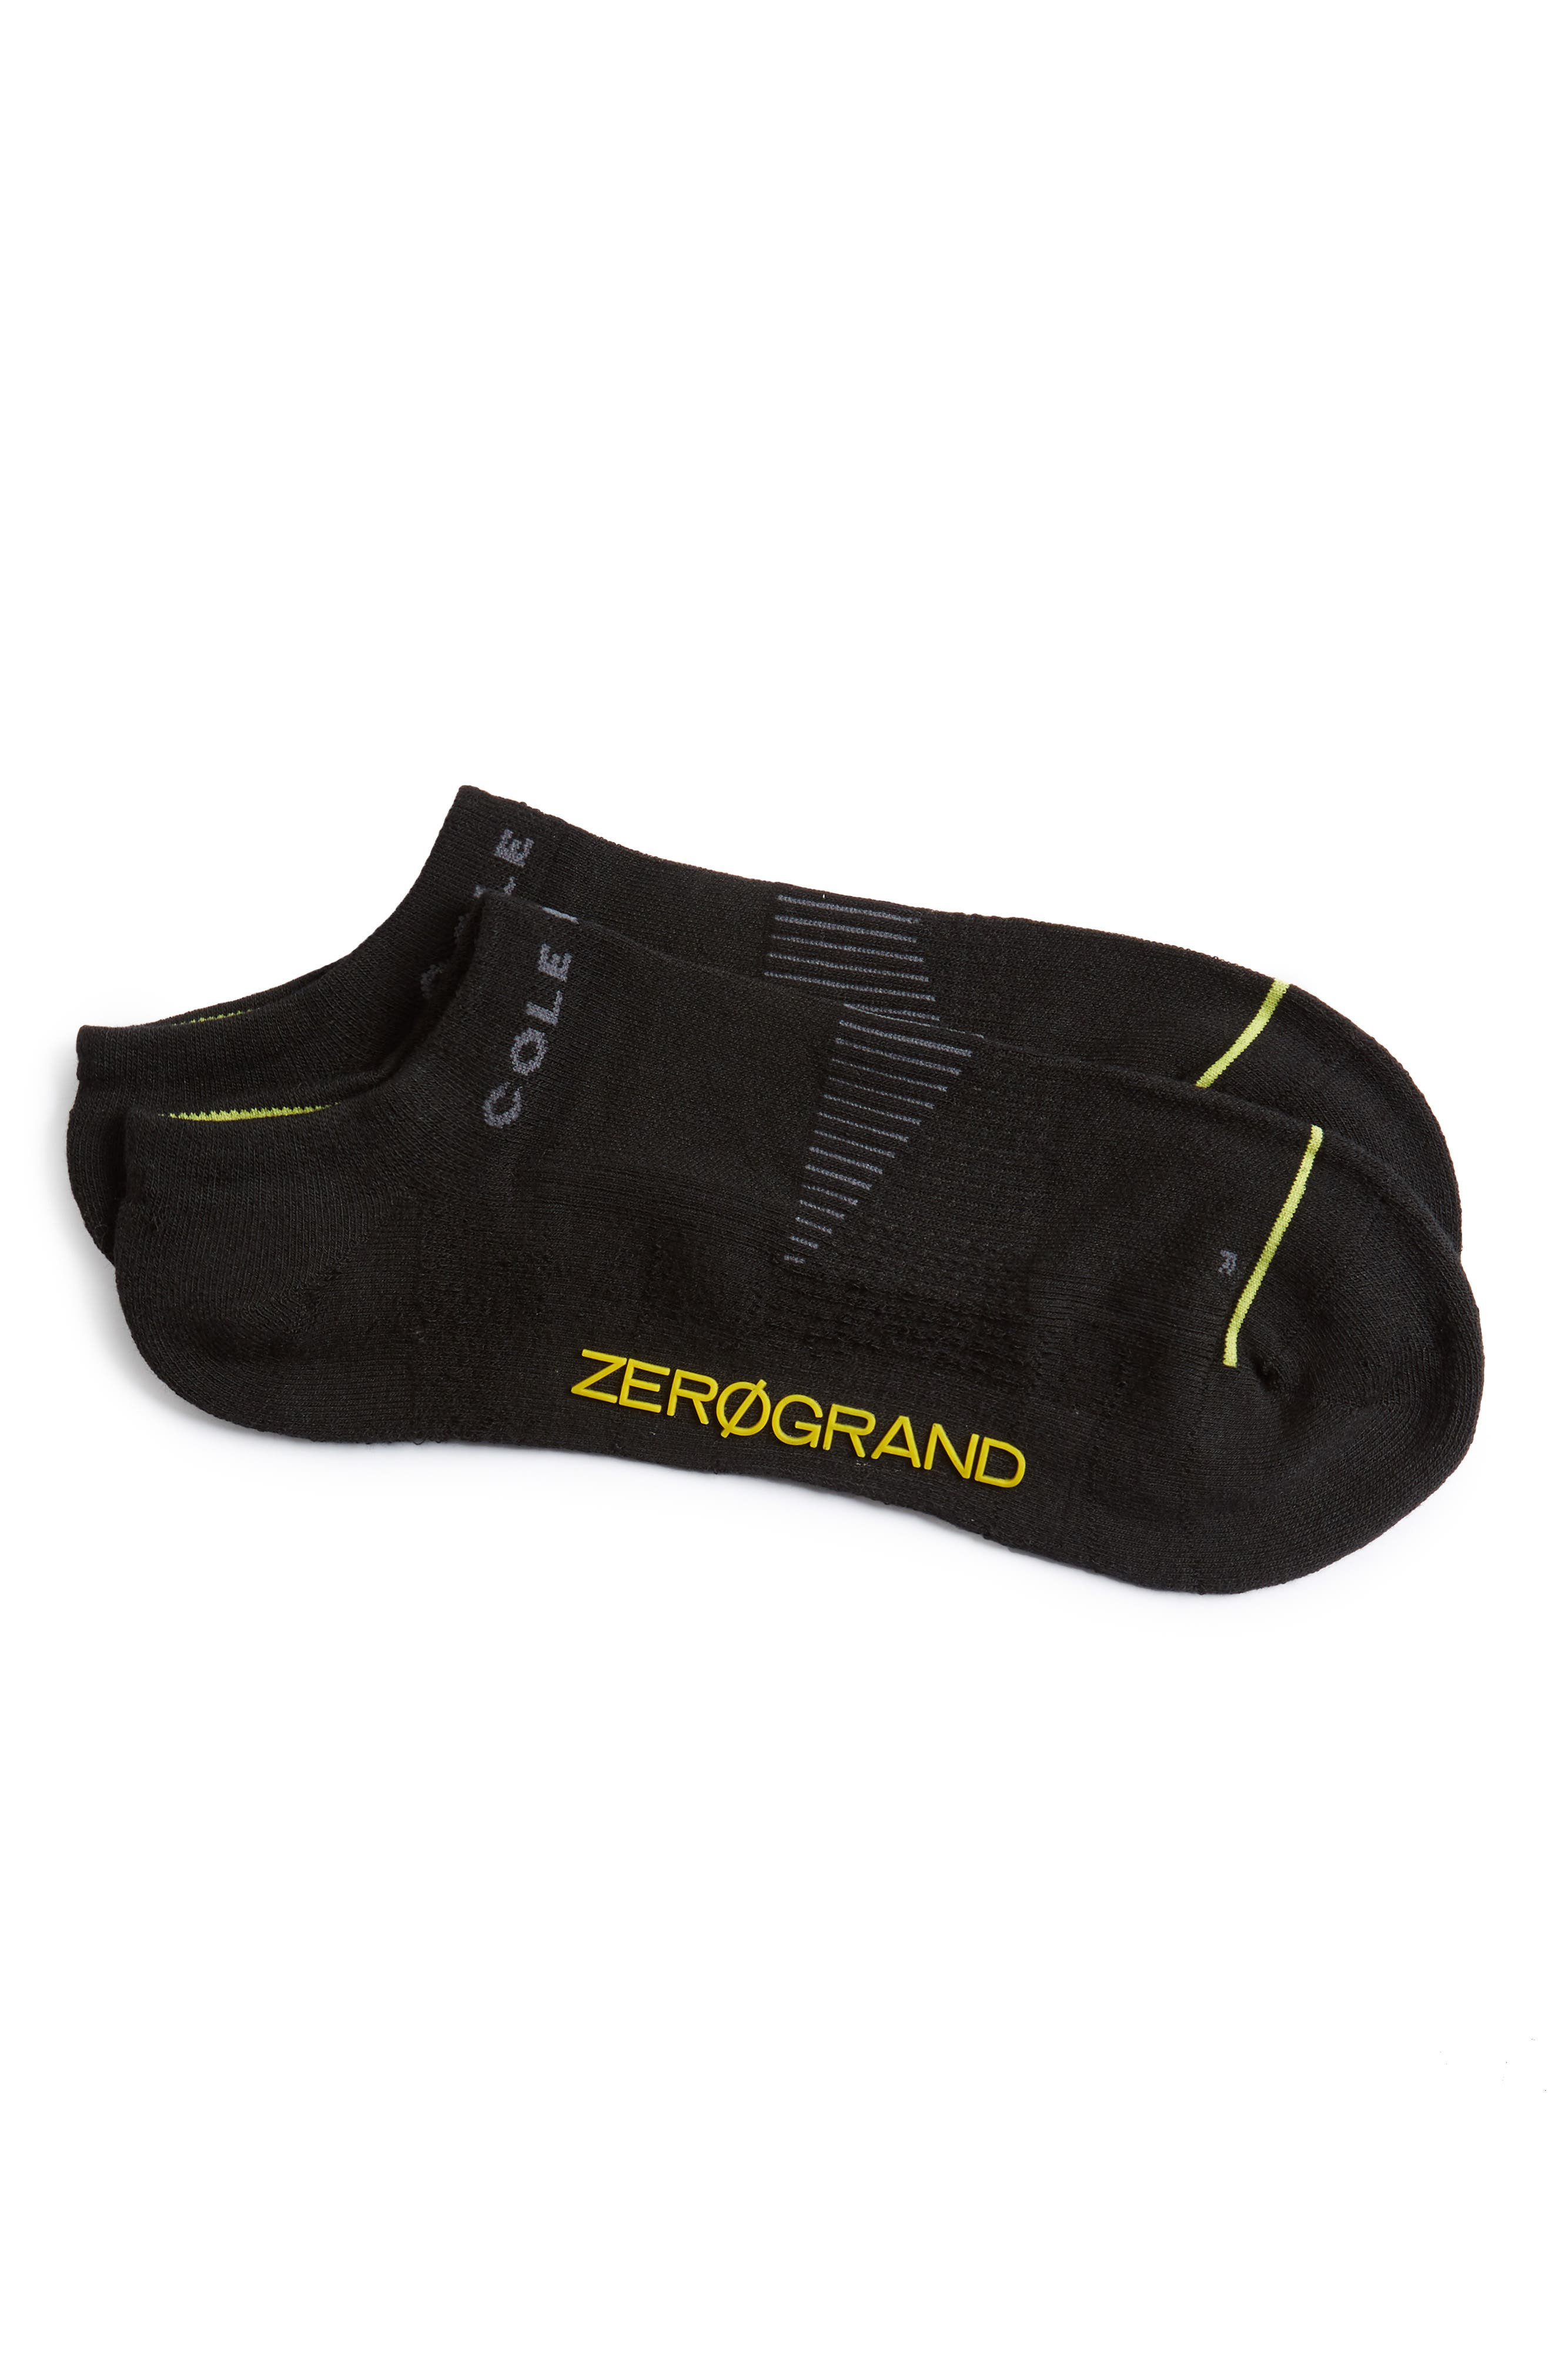 COLE HAAN ZeroGrand Liner Socks, Main, color, 001